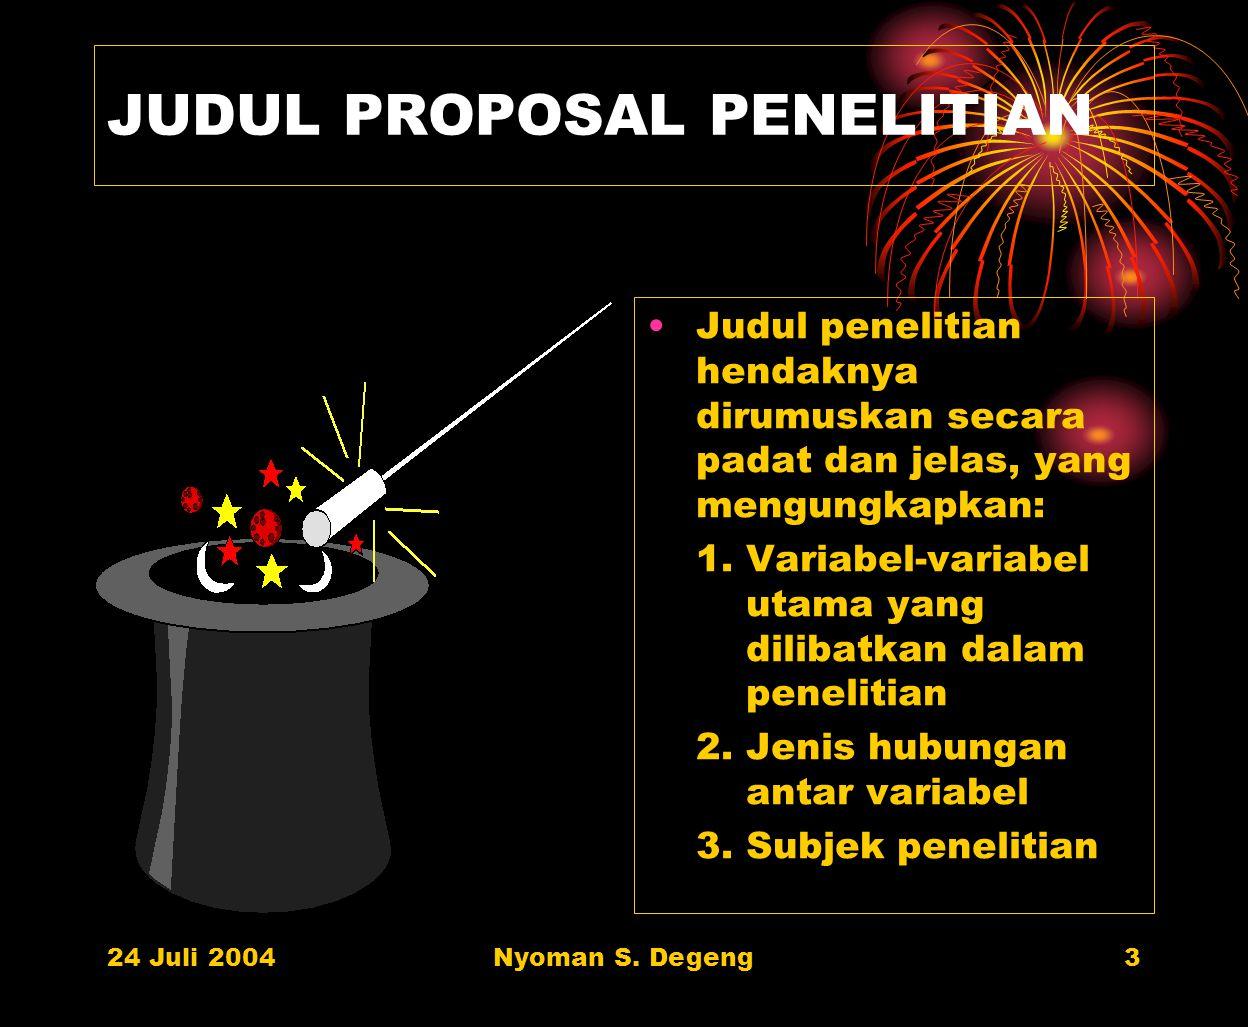 24 Juli 2004Nyoman S. Degeng2 KOMPONEN PROPOSAL PENELITIAN : Disain Eksperimental JUDUL PENELITIAN Masalah Penelitian Latar belakang masalah Rumusan m